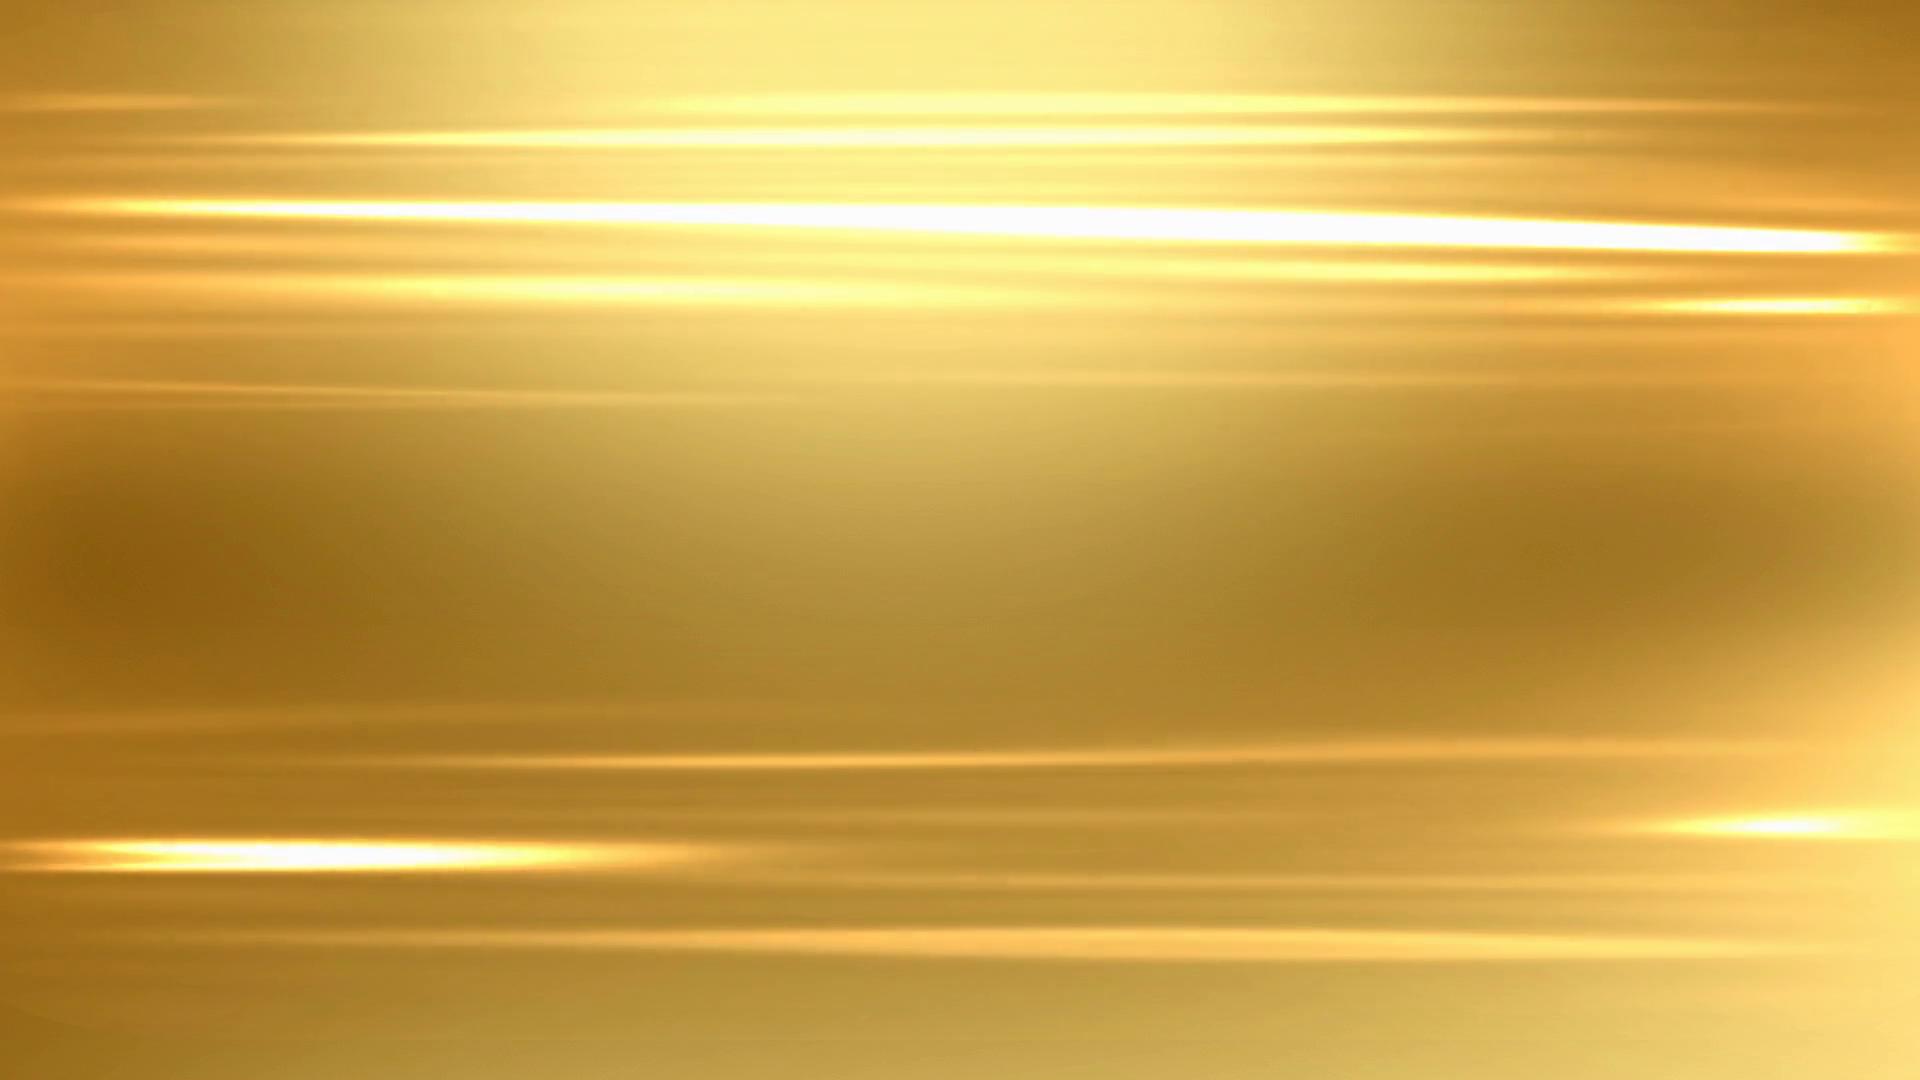 Golden Wedding Background Motion Background Storyblocks